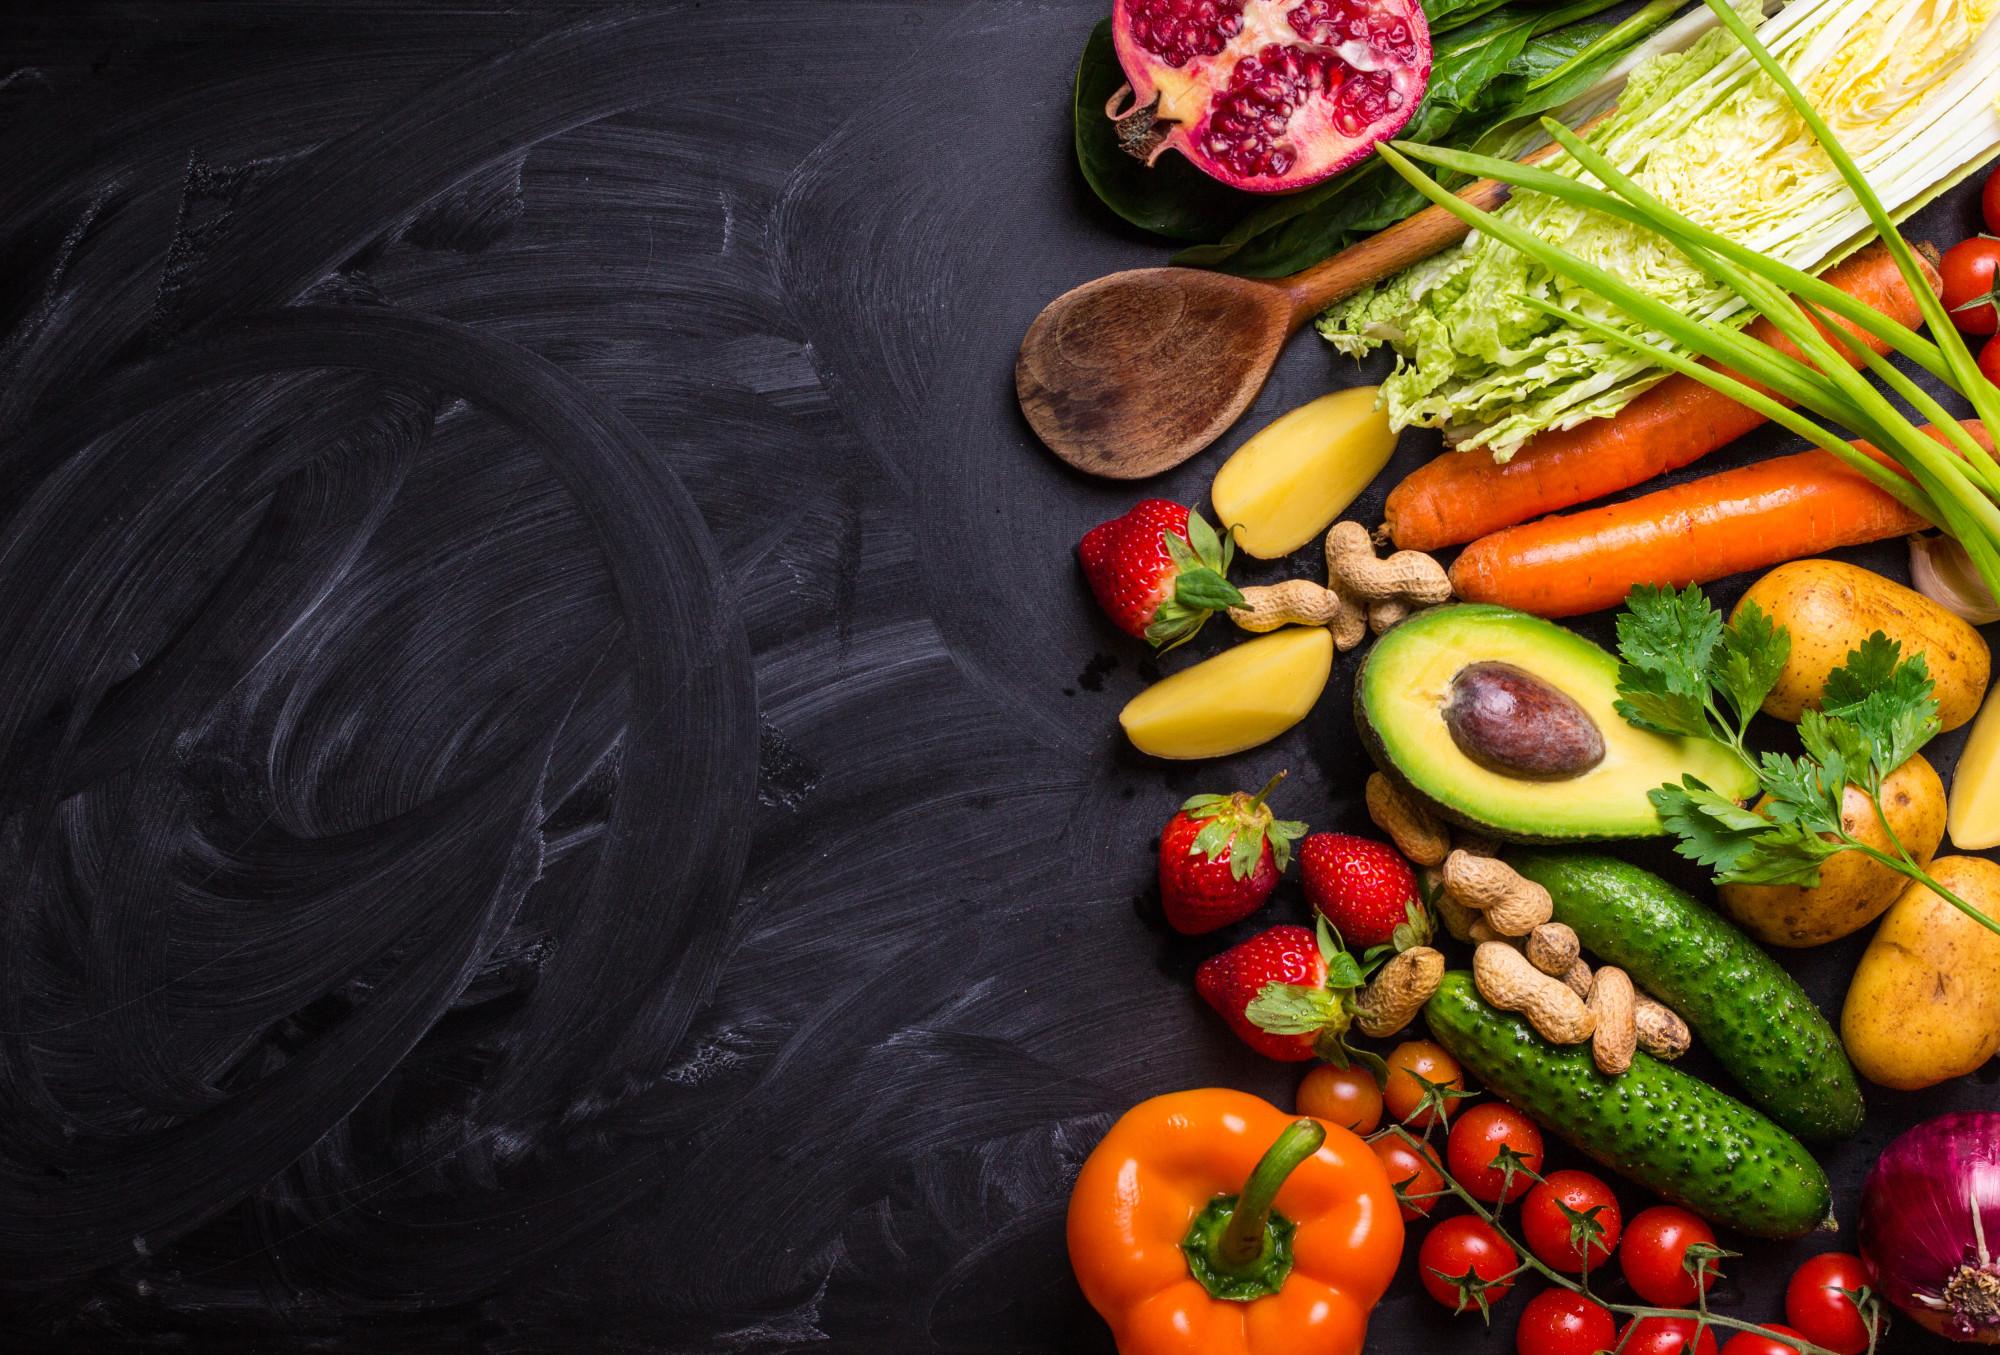 Health Benefits to eating organic